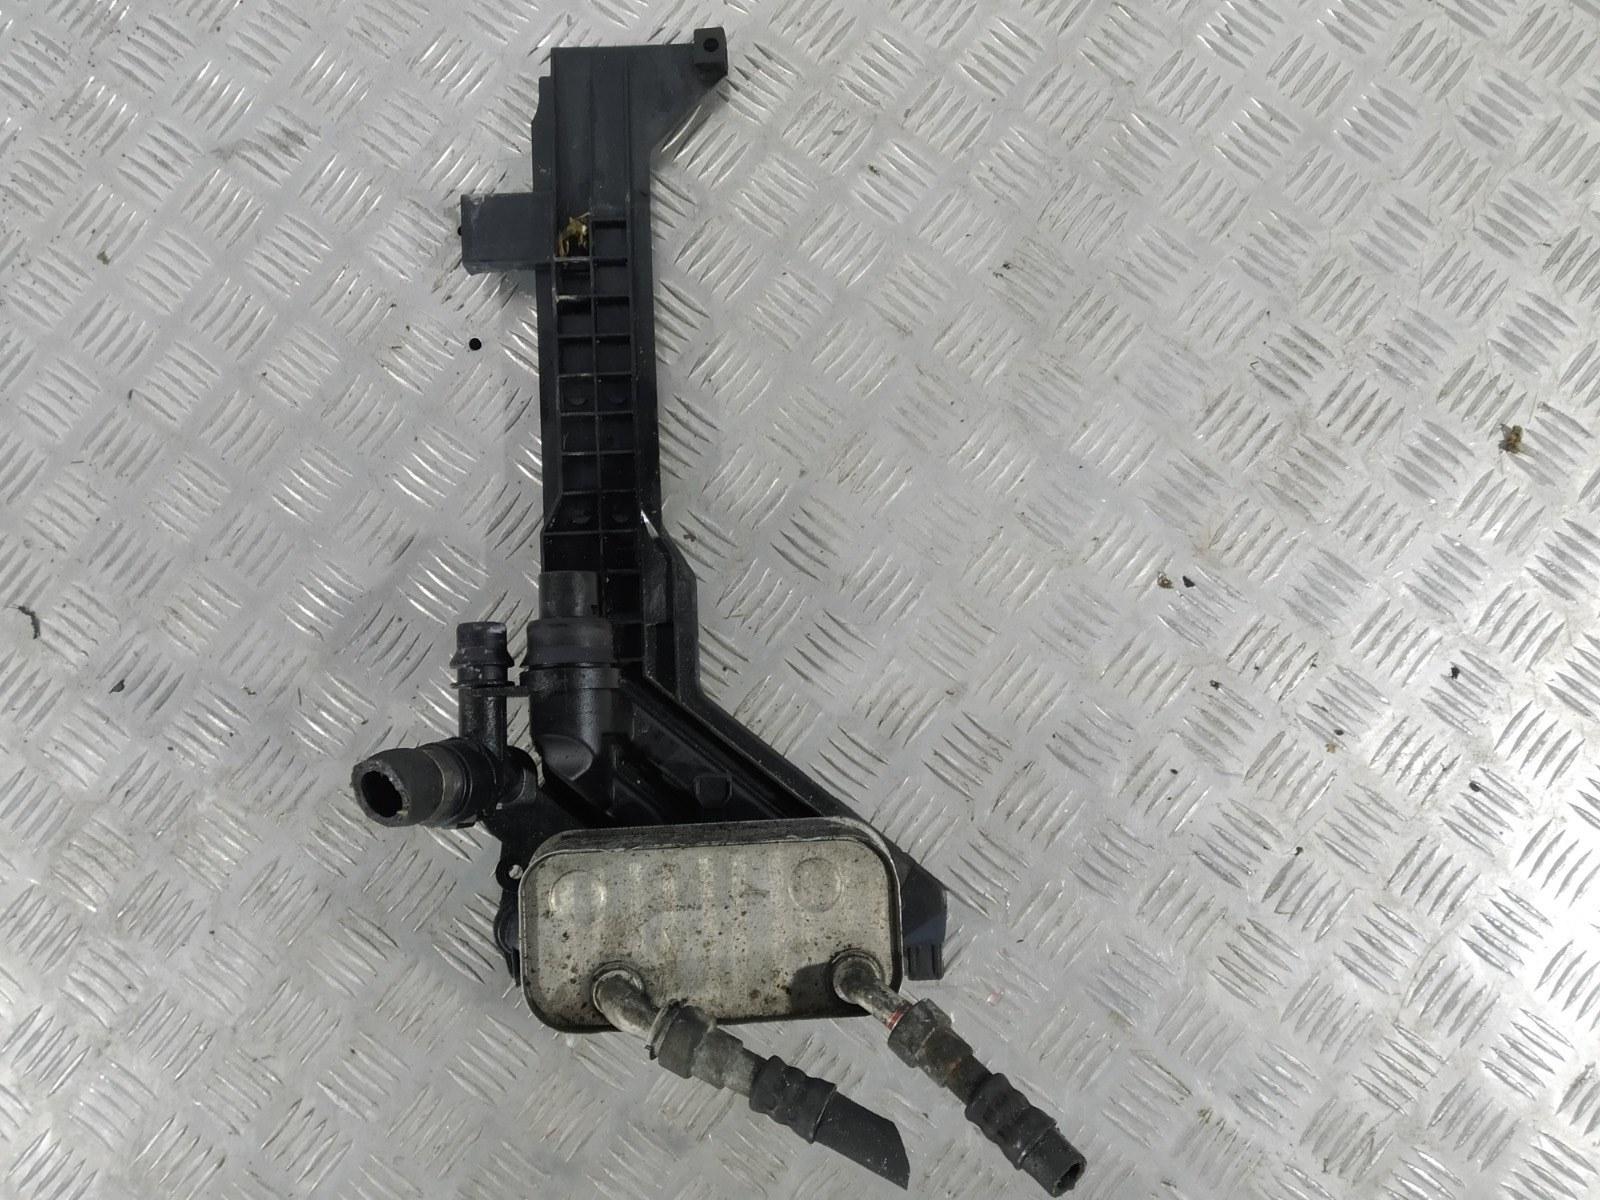 Радиатор масляный Bmw 3 E46 2.5 I 2003 (б/у)